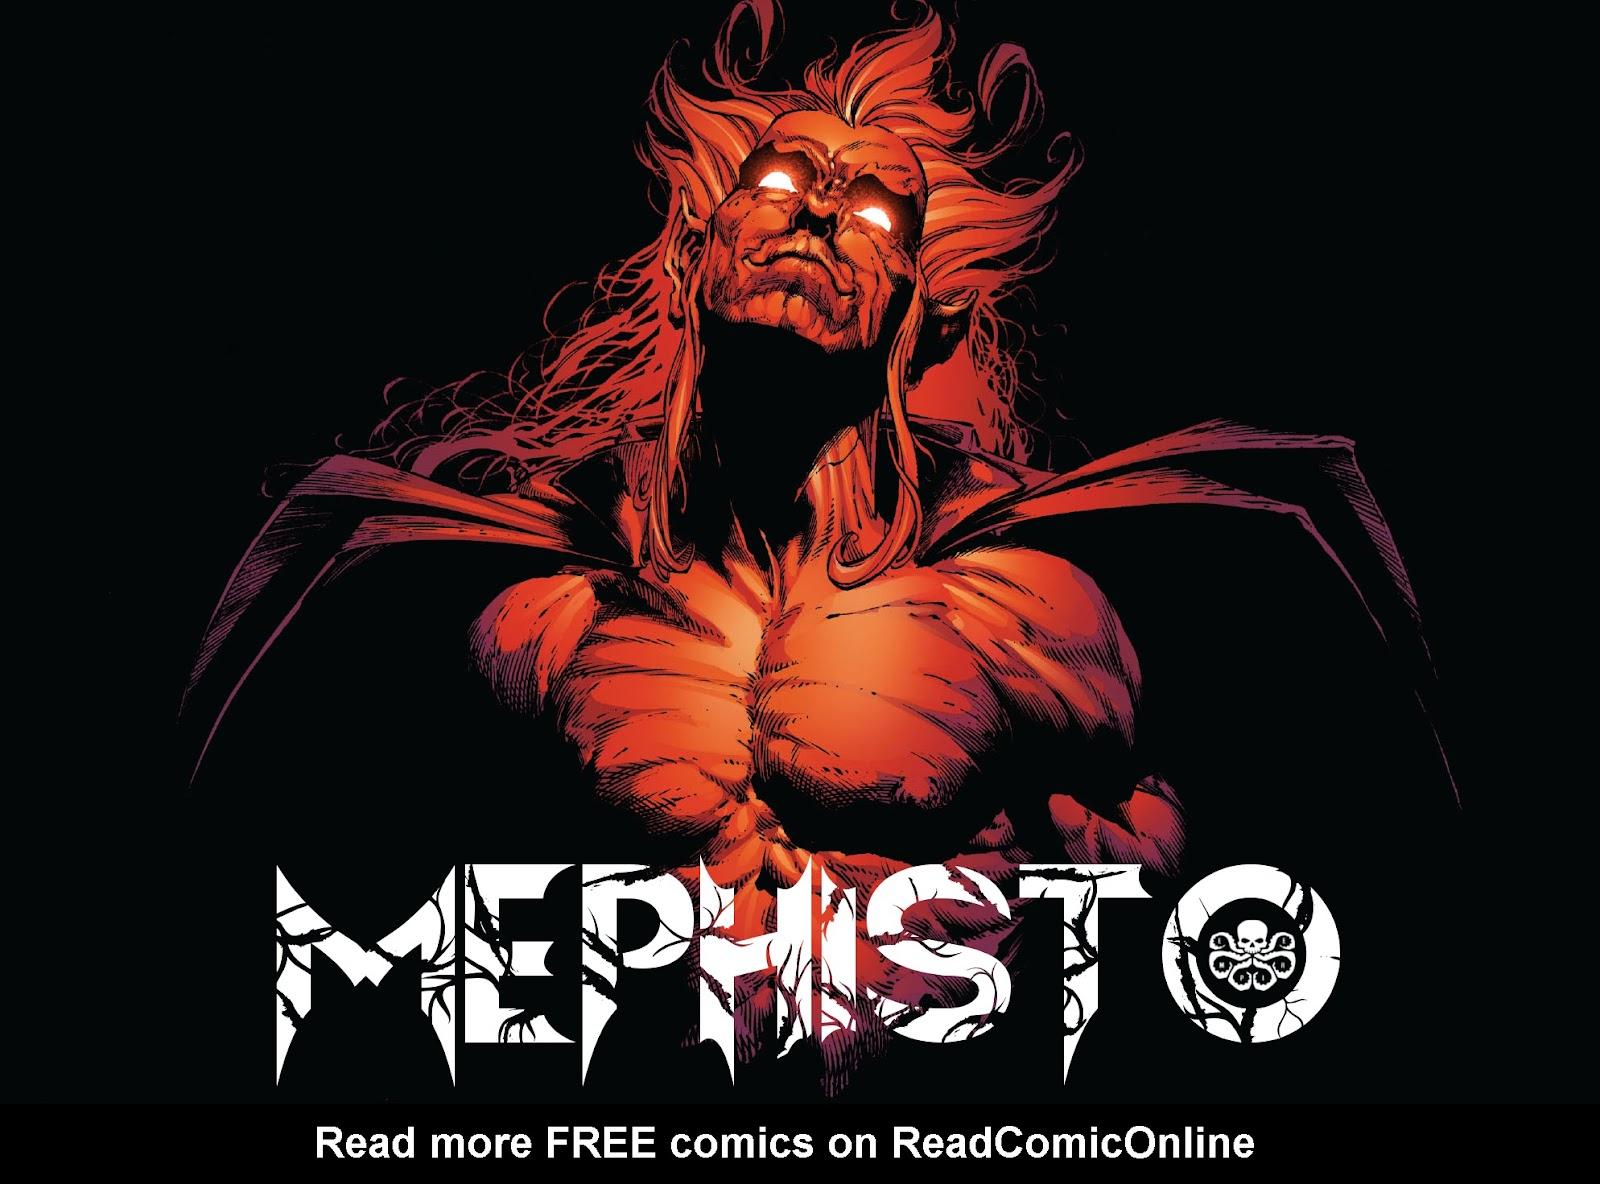 Read online Alienated comic -  Issue #2 - 30